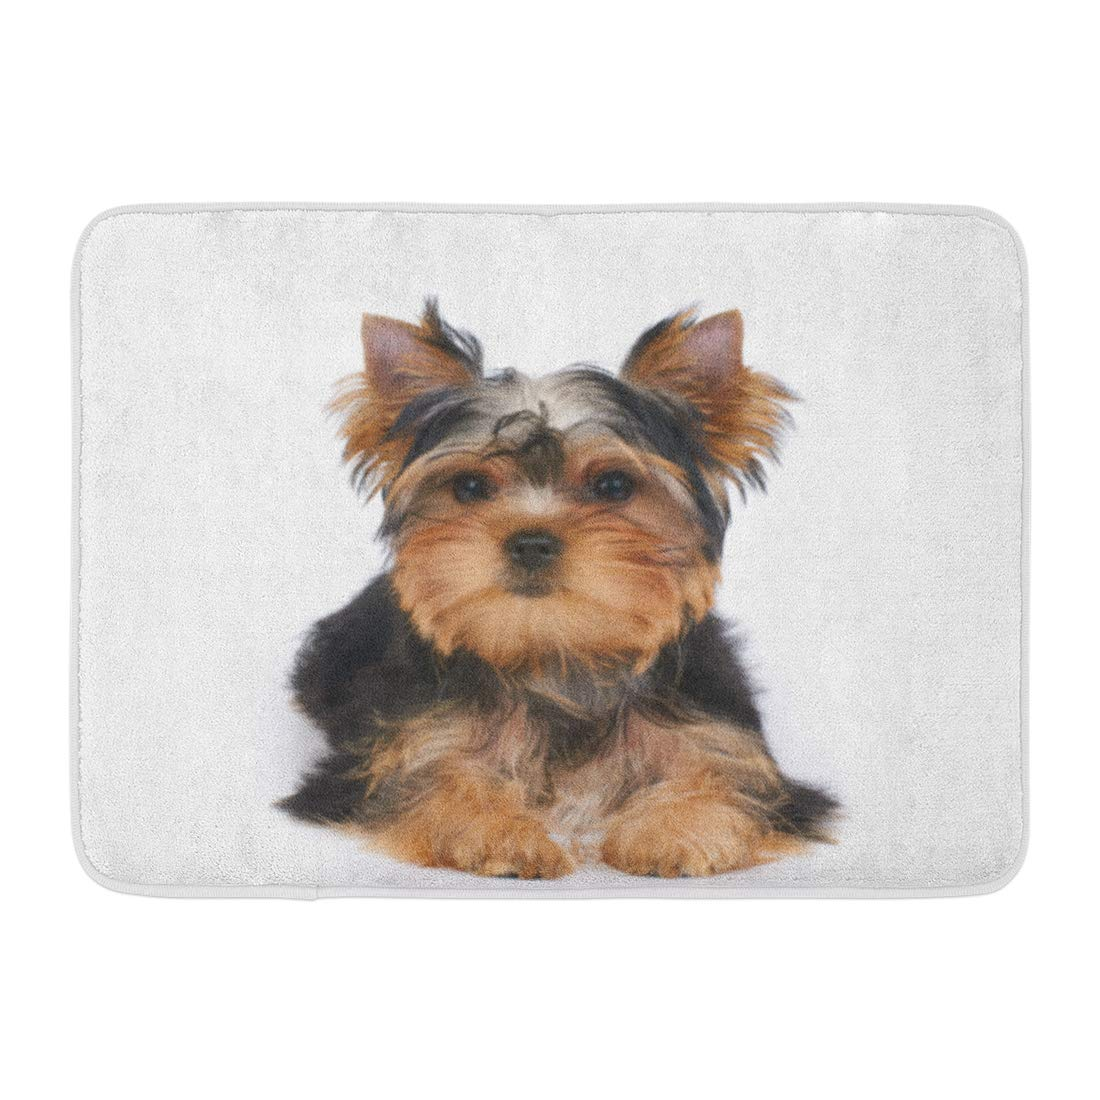 Sidonku Dog One Puppy Of The Yorkshire Terrier Lies On White Small Yorkie Adorable Doormat Floor Rug Bath Mat 23 6x15 7 Inch Walmart Com Walmart Com